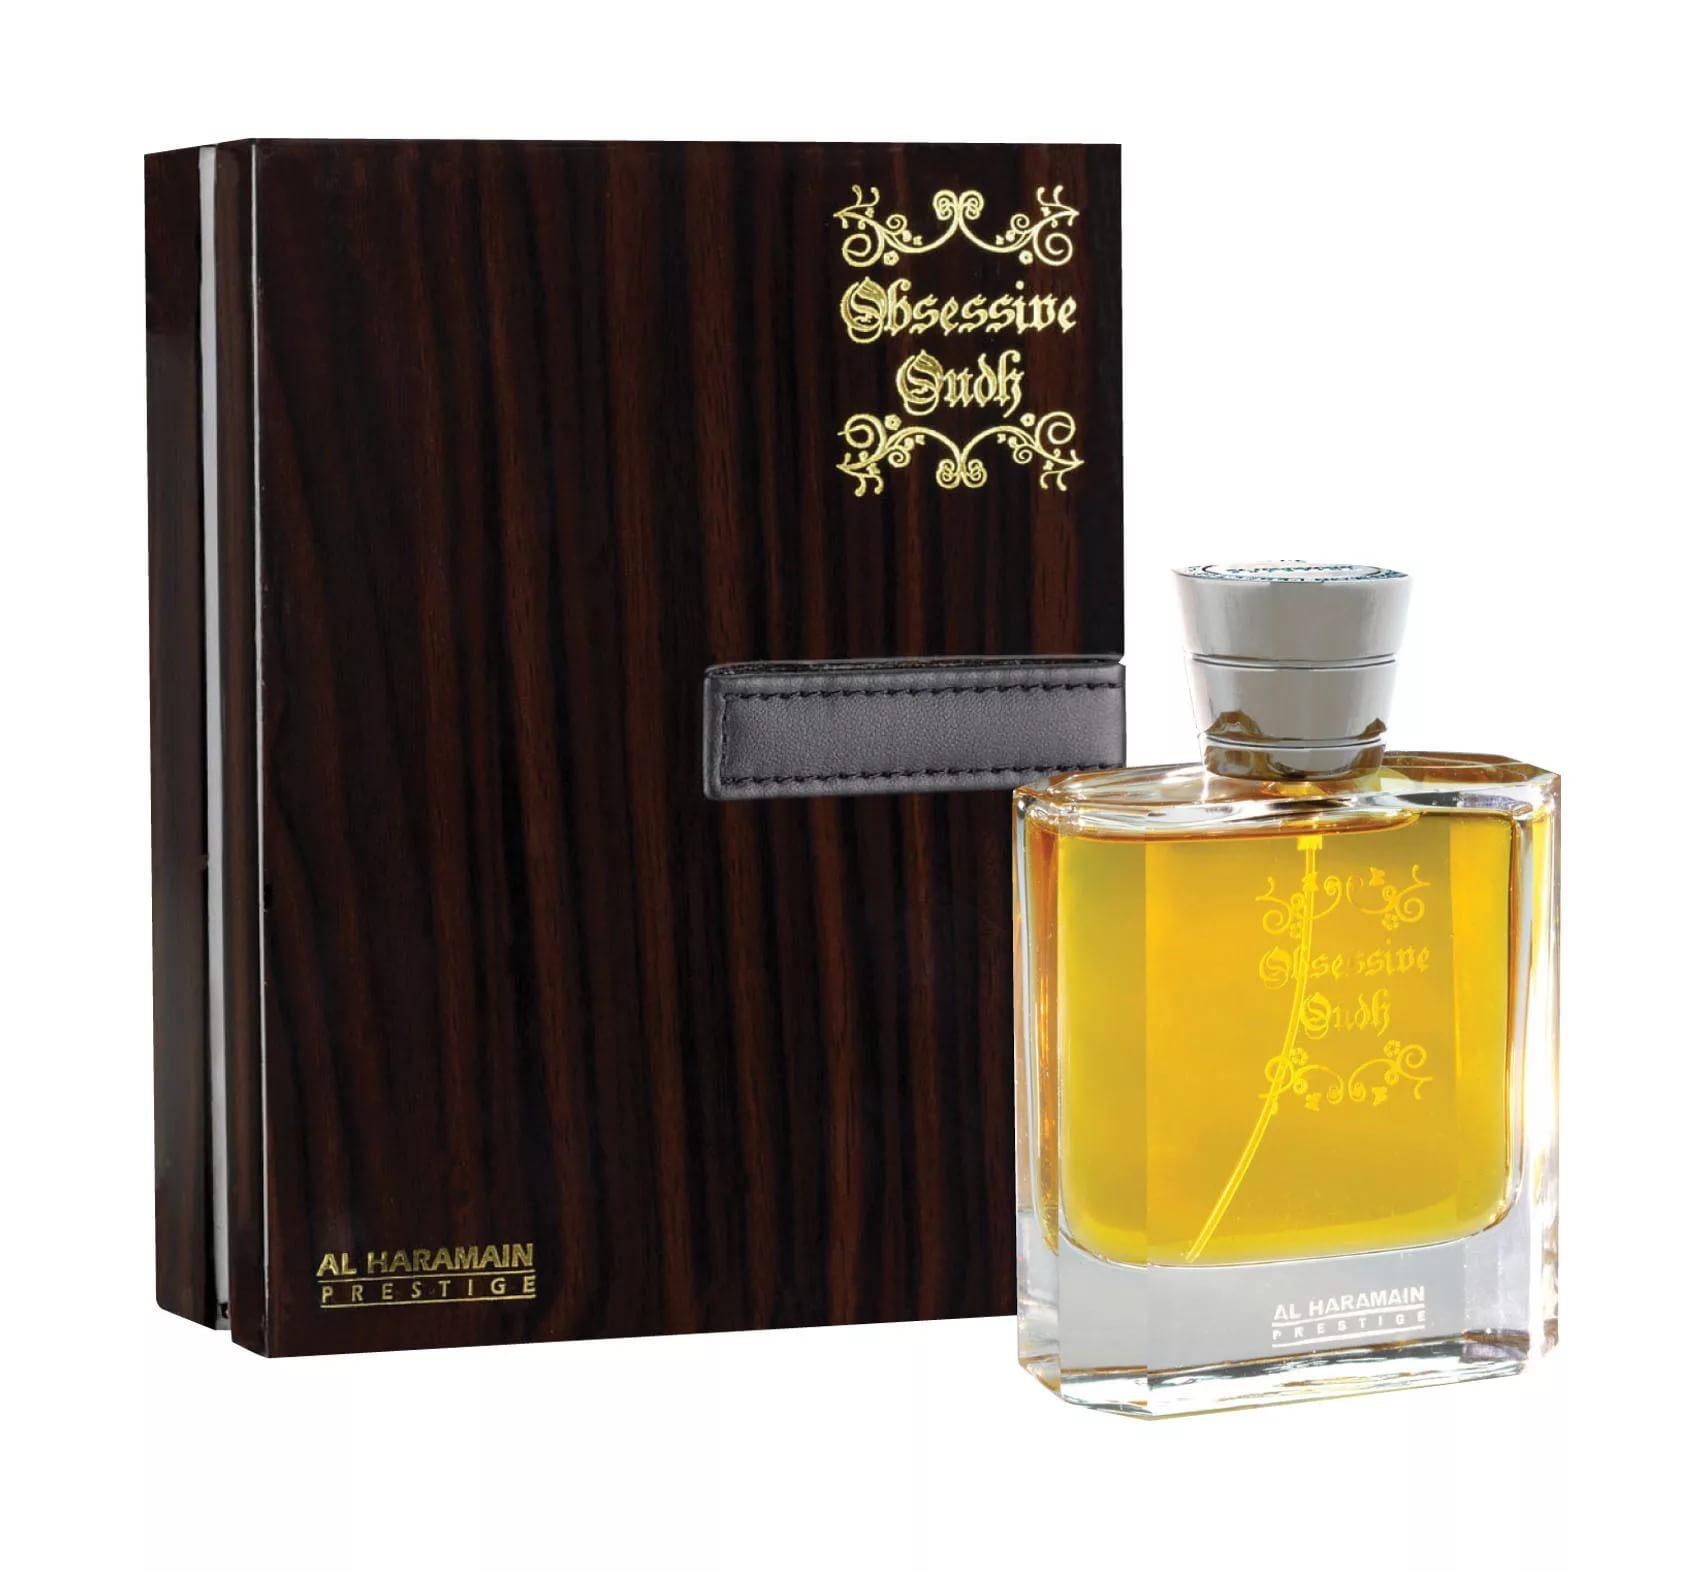 Al Haramain Perfumes Obsessive Oudh